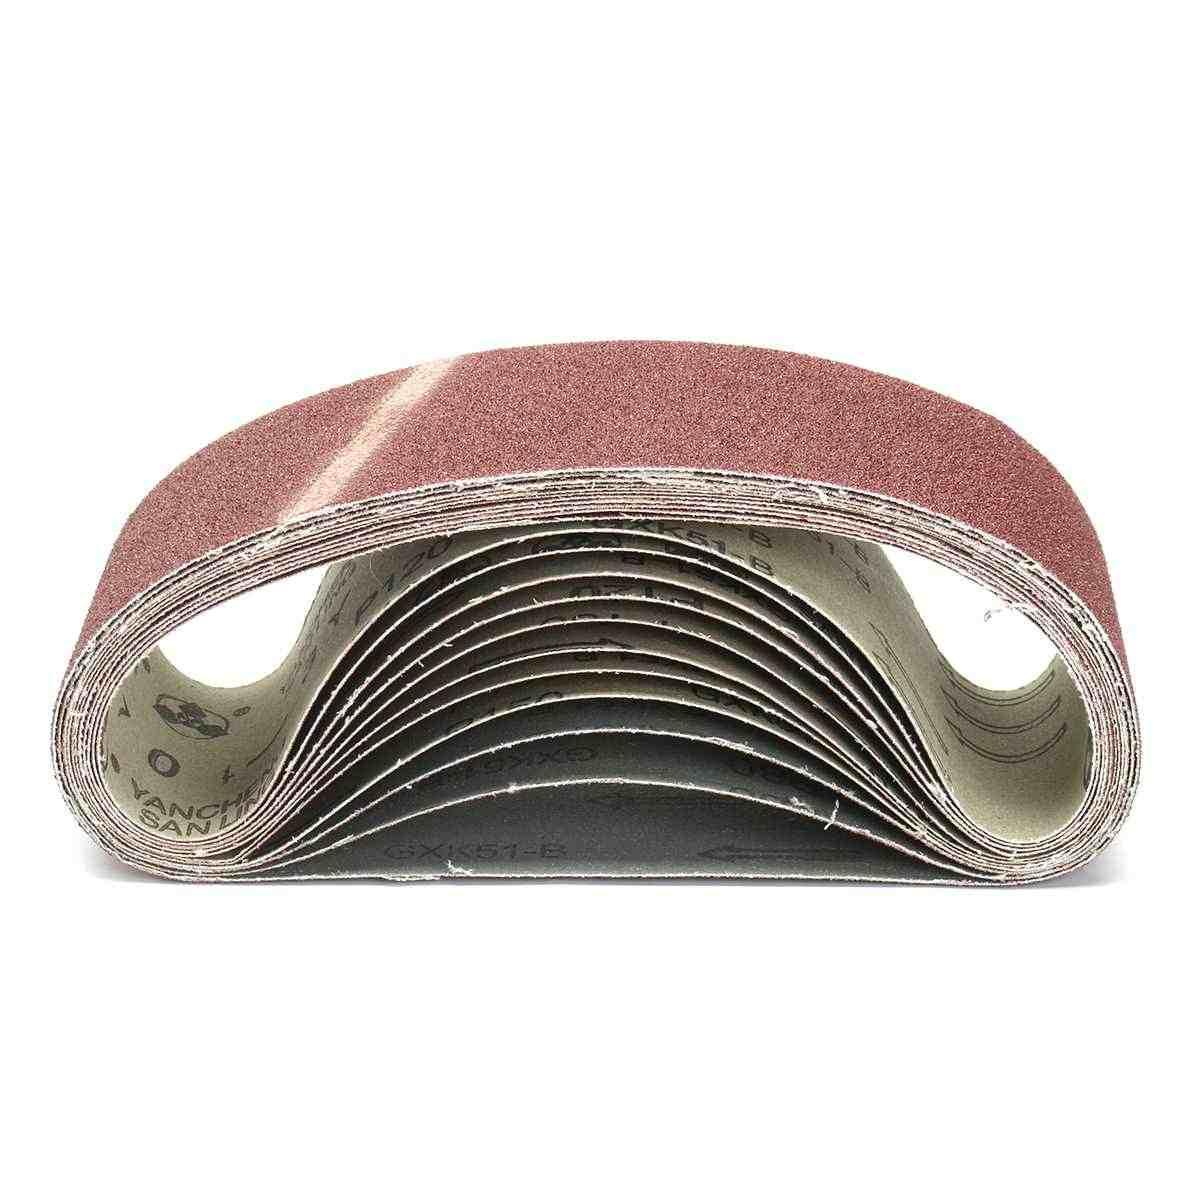 11Pcs Schuren Riemen 75Mm X 533Mm 80 120 150 Gemengde Grit Aluminiumoxide Sander Bestand Riem Set Schurende gereedschap Accessoires